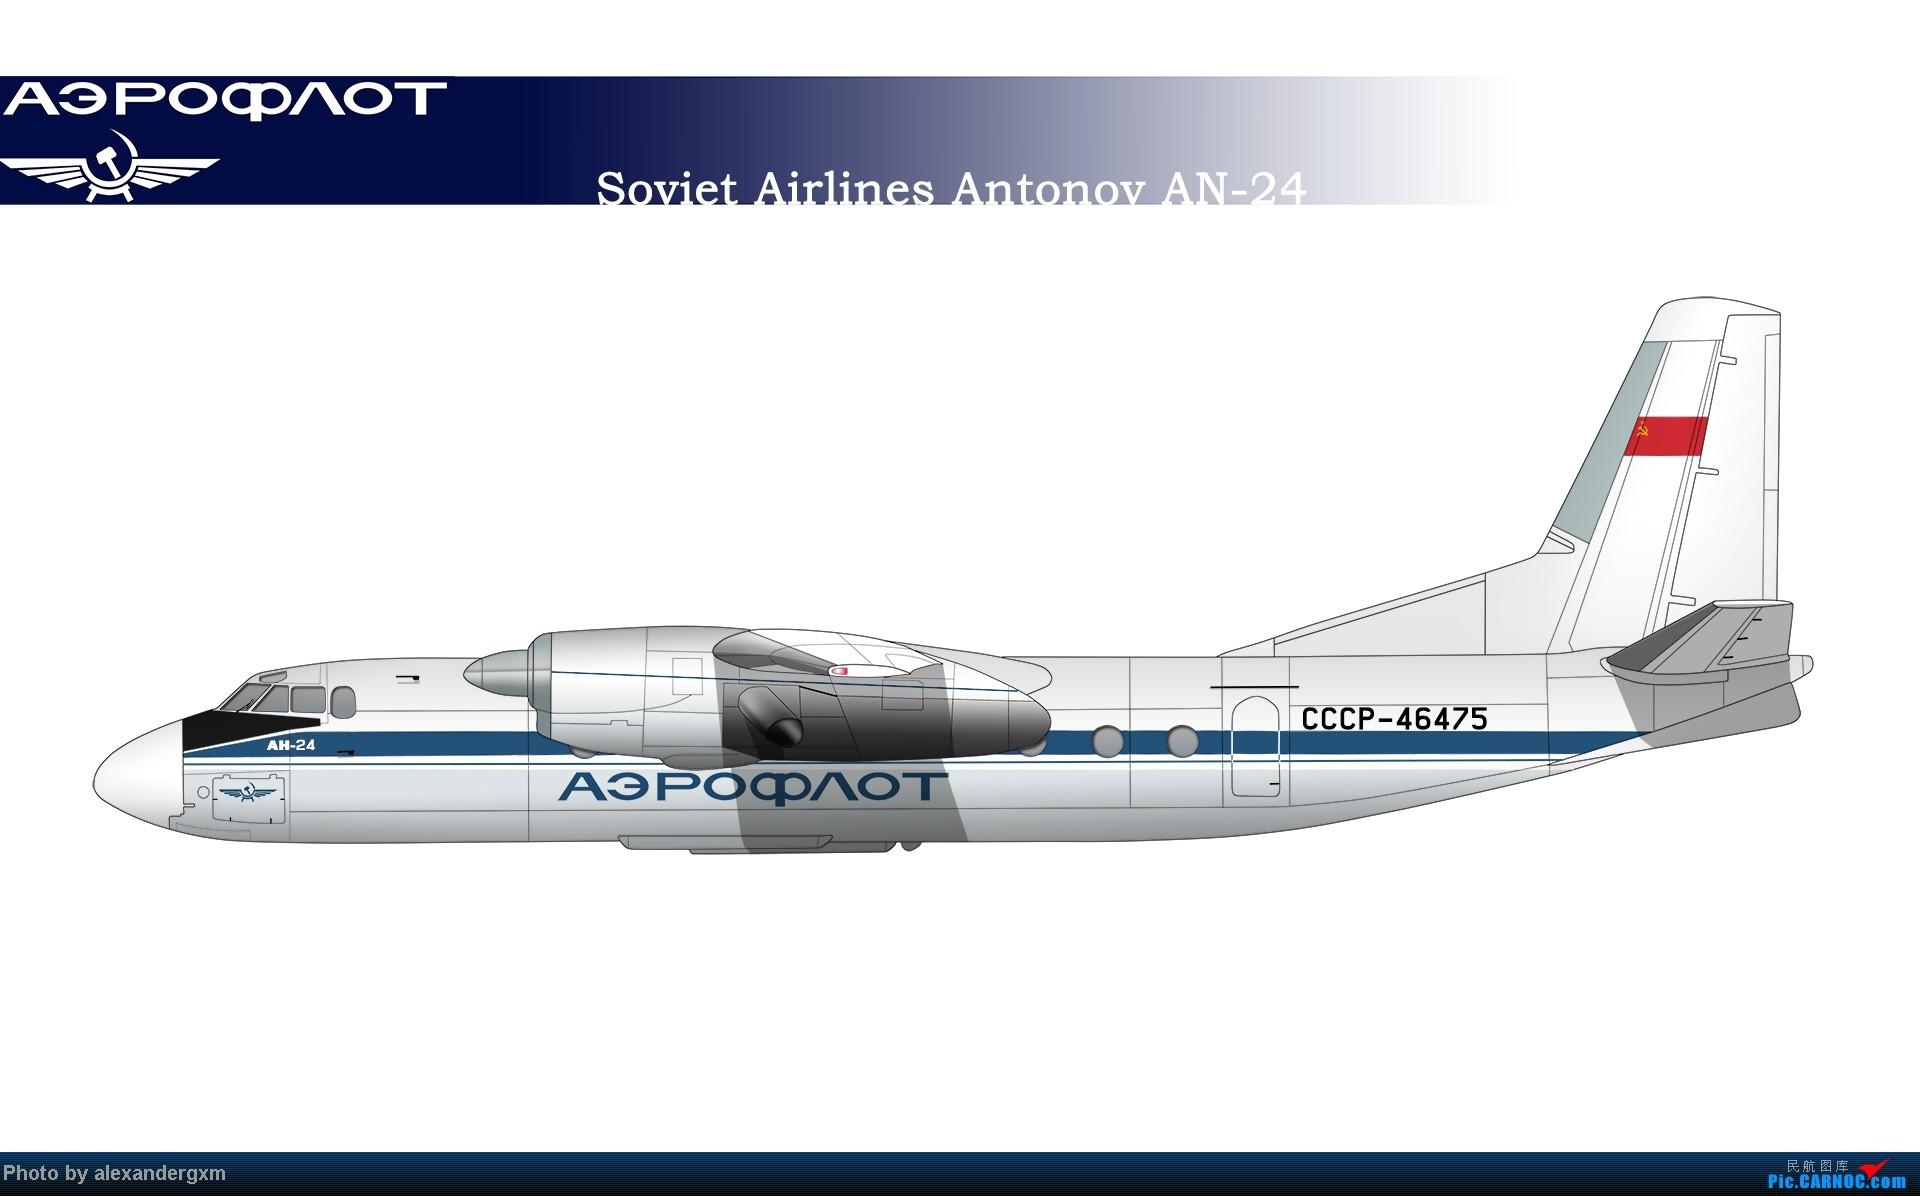 Re:[原创]发一些自己业余画的一些飞机啦~大部分侧视图~ AN-24